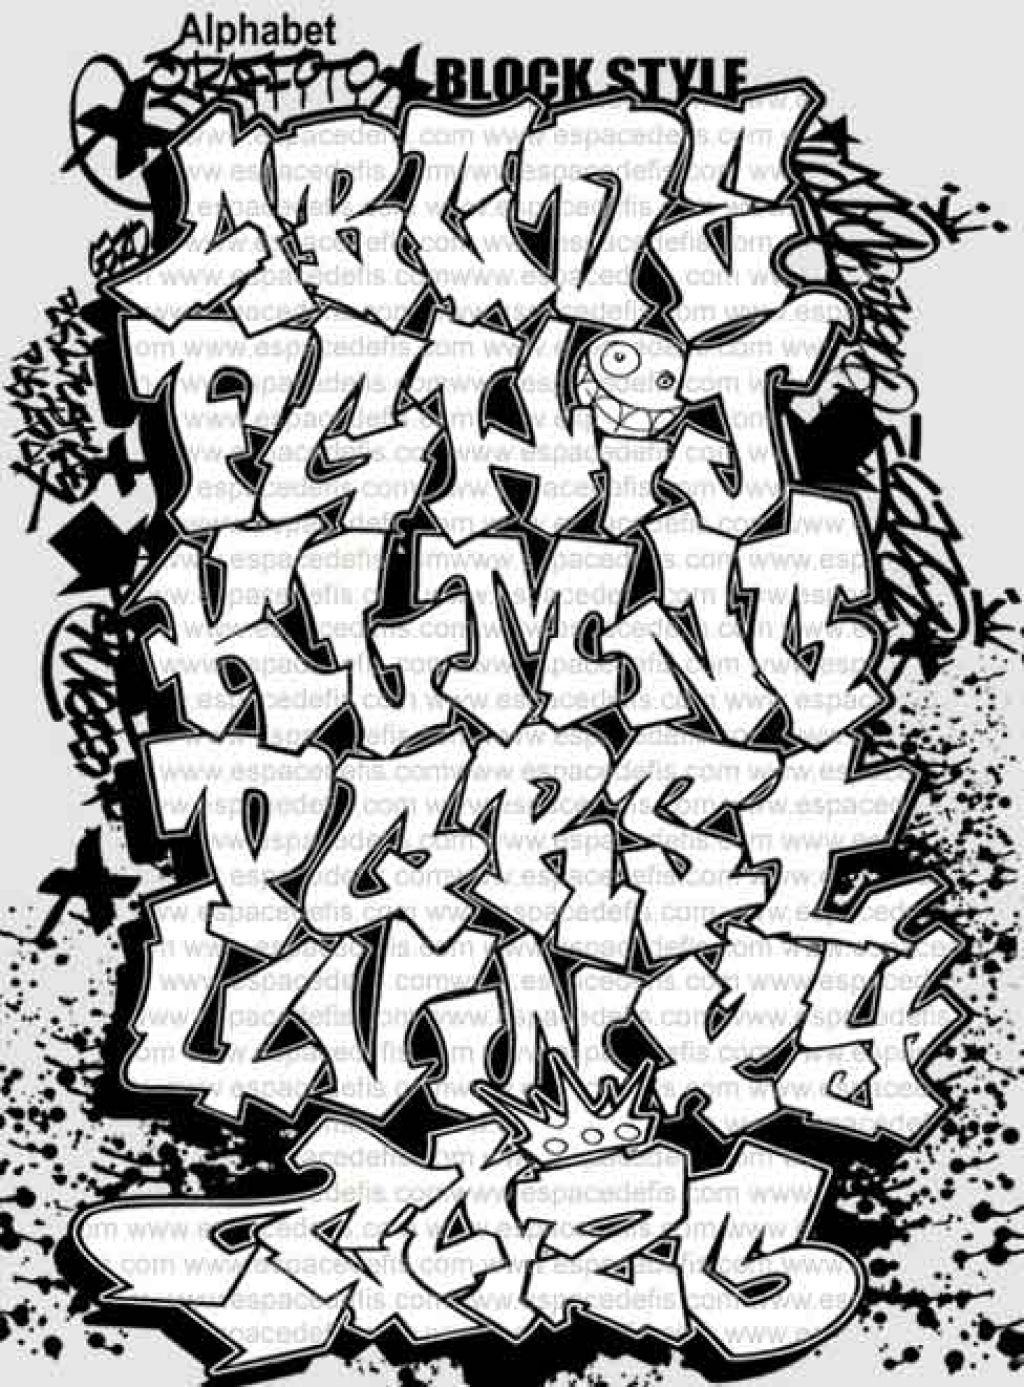 Draw Graffiti Letters Az Step Alphabet Amazing 3D Free Printable - Free Printable Graffiti Letters Az